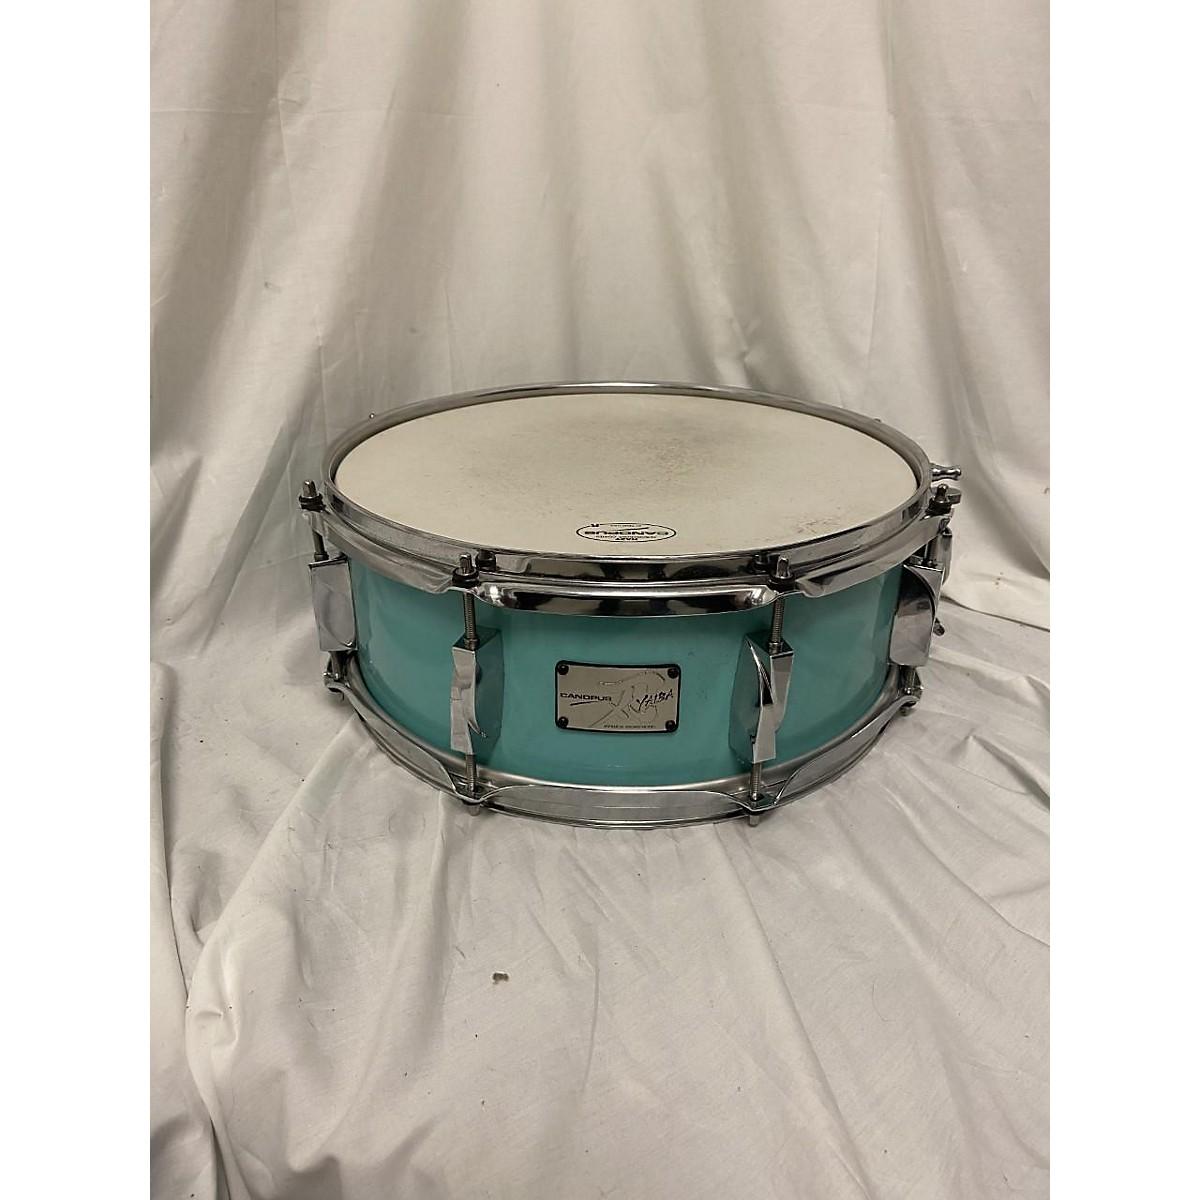 Canopus 5.5X14 Yaiba Birch Drum